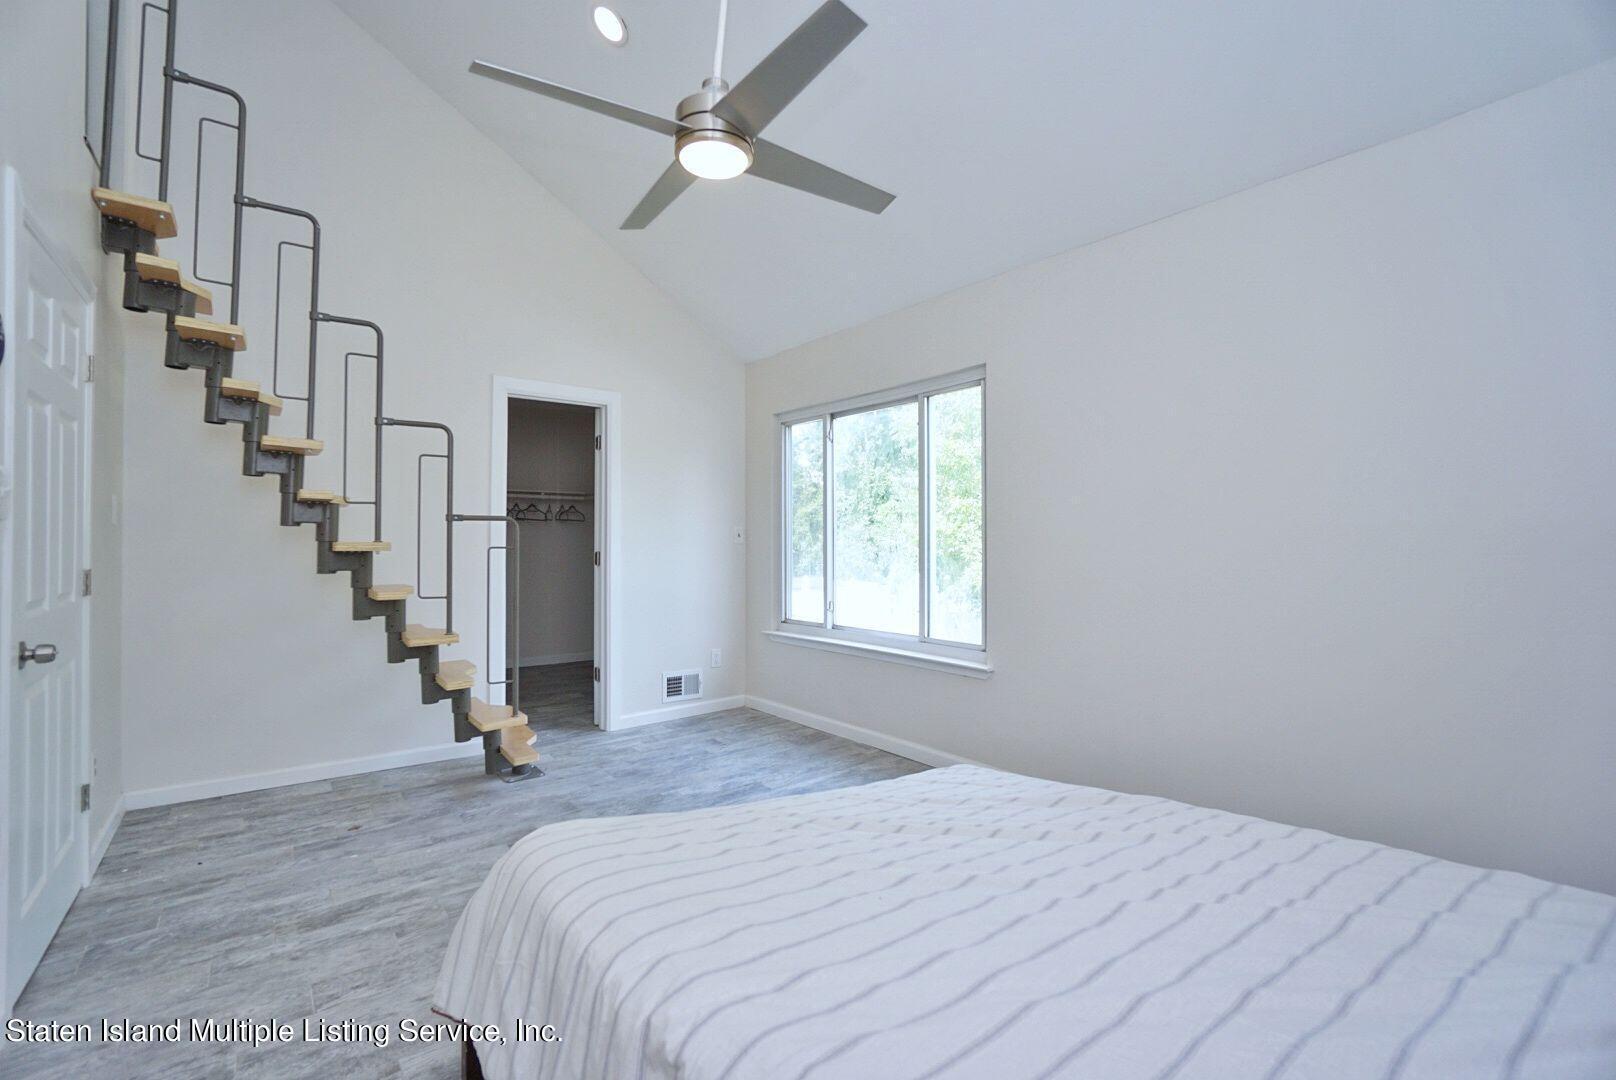 Single Family - Detached 83 Boylan Street  Staten Island, NY 10312, MLS-1149266-14